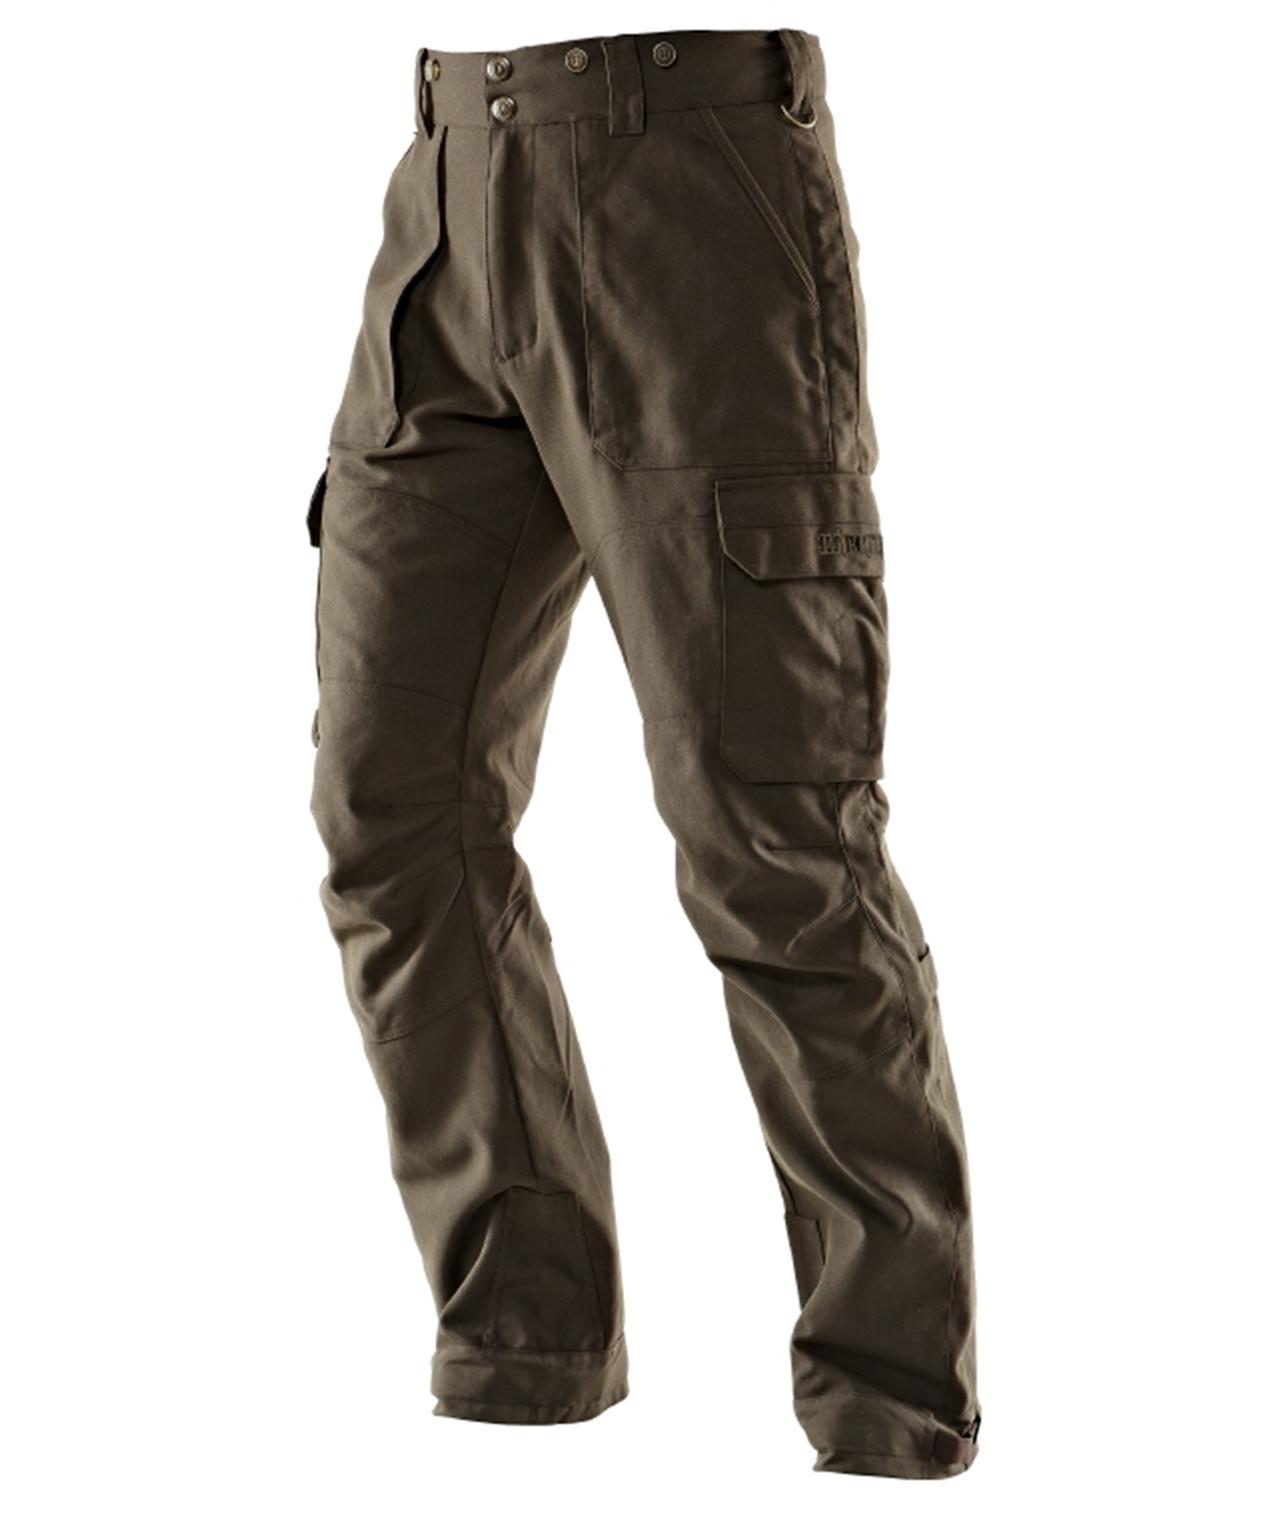 3a15a87134b Härkila Pro Hunter X bukser